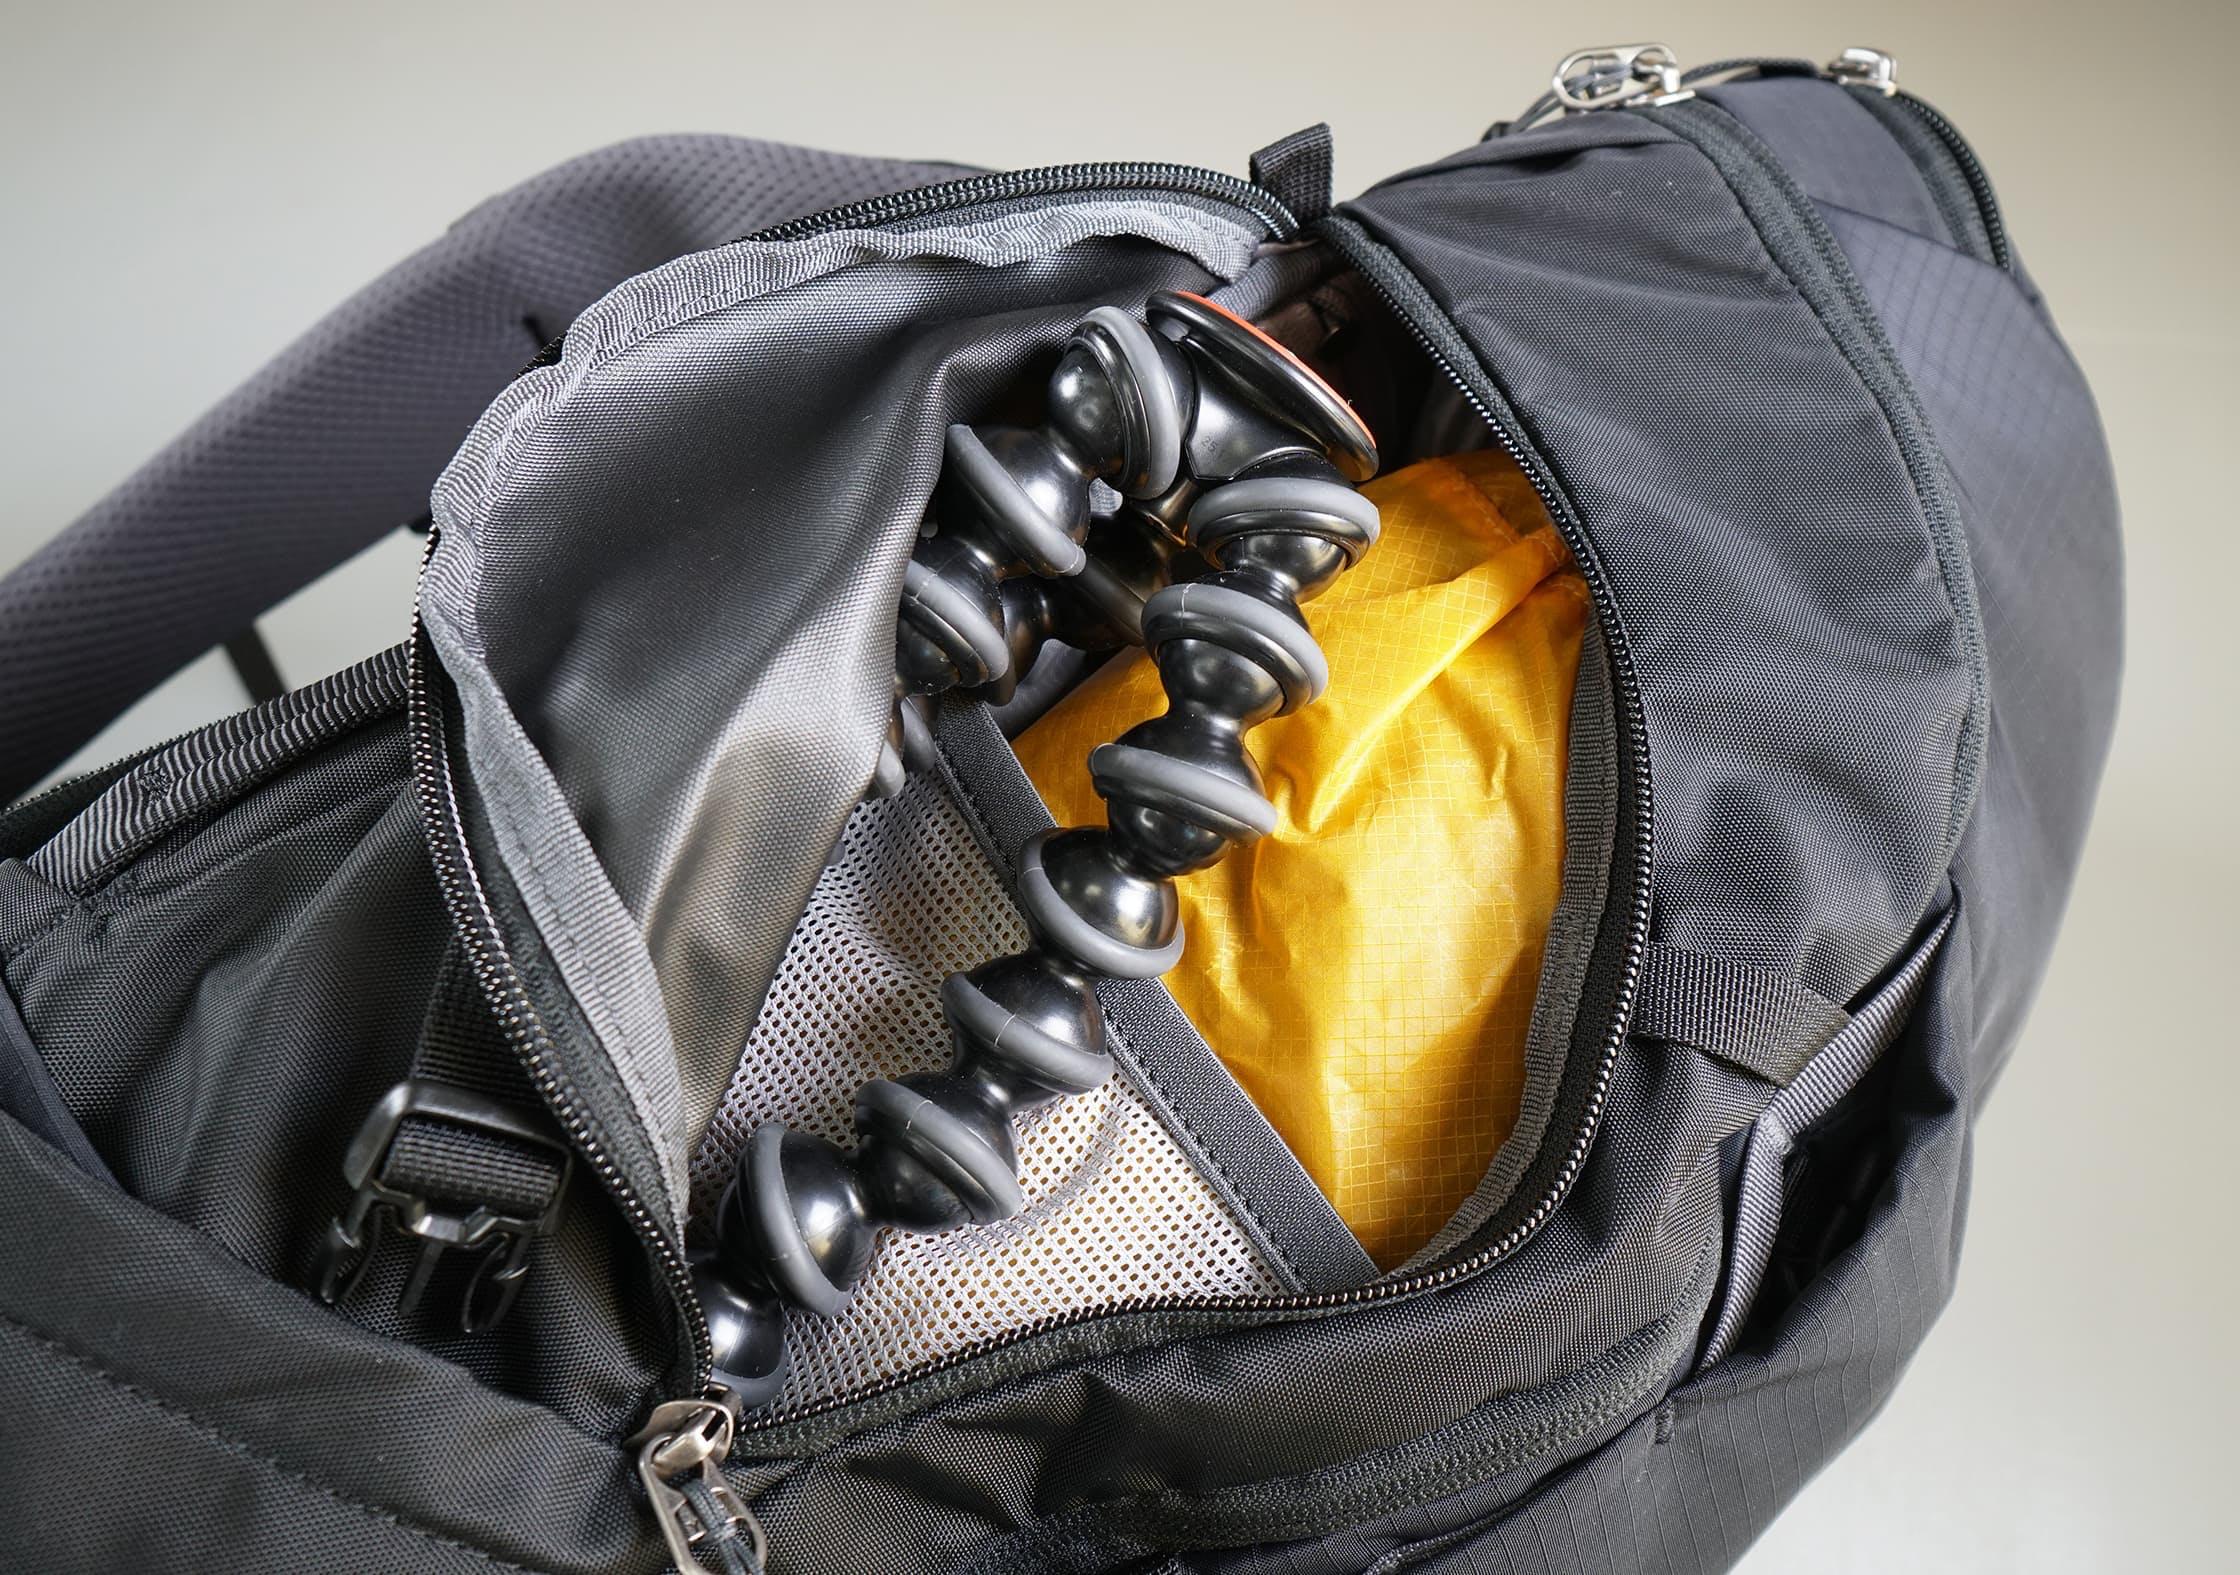 REI Ruckpack 40 Interior Side Pocket